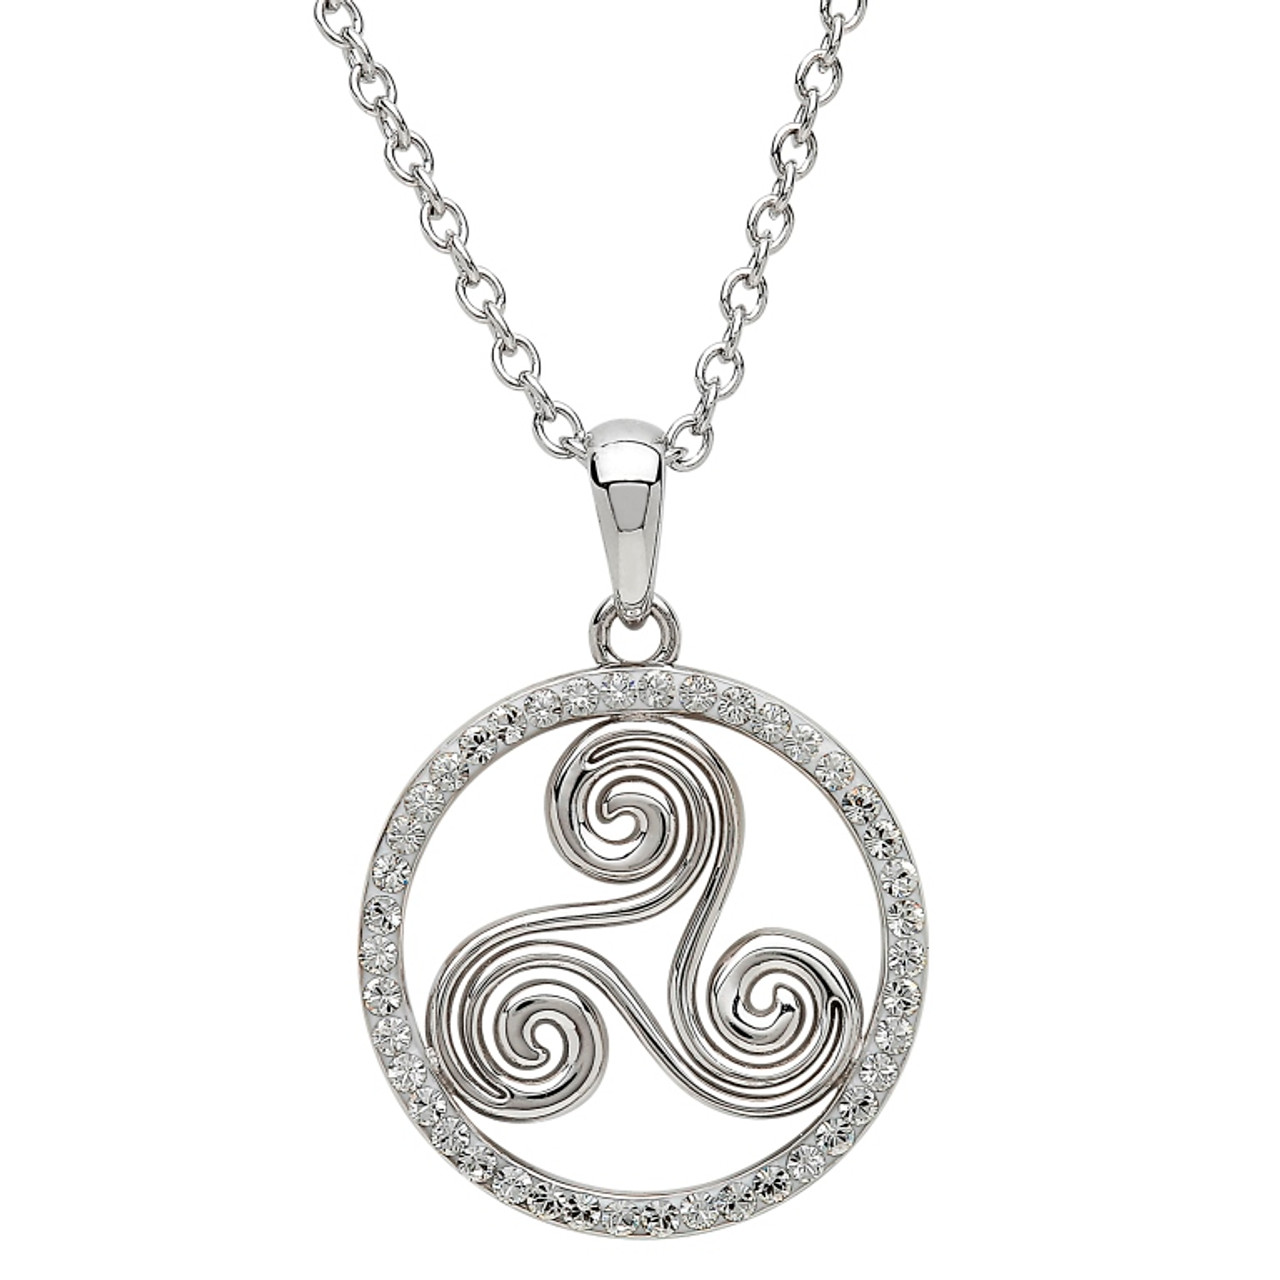 7038c61bc15f1 Sterling Silver Newgrange Spiral Pendant Embellished with Swarovski® White  Crystals